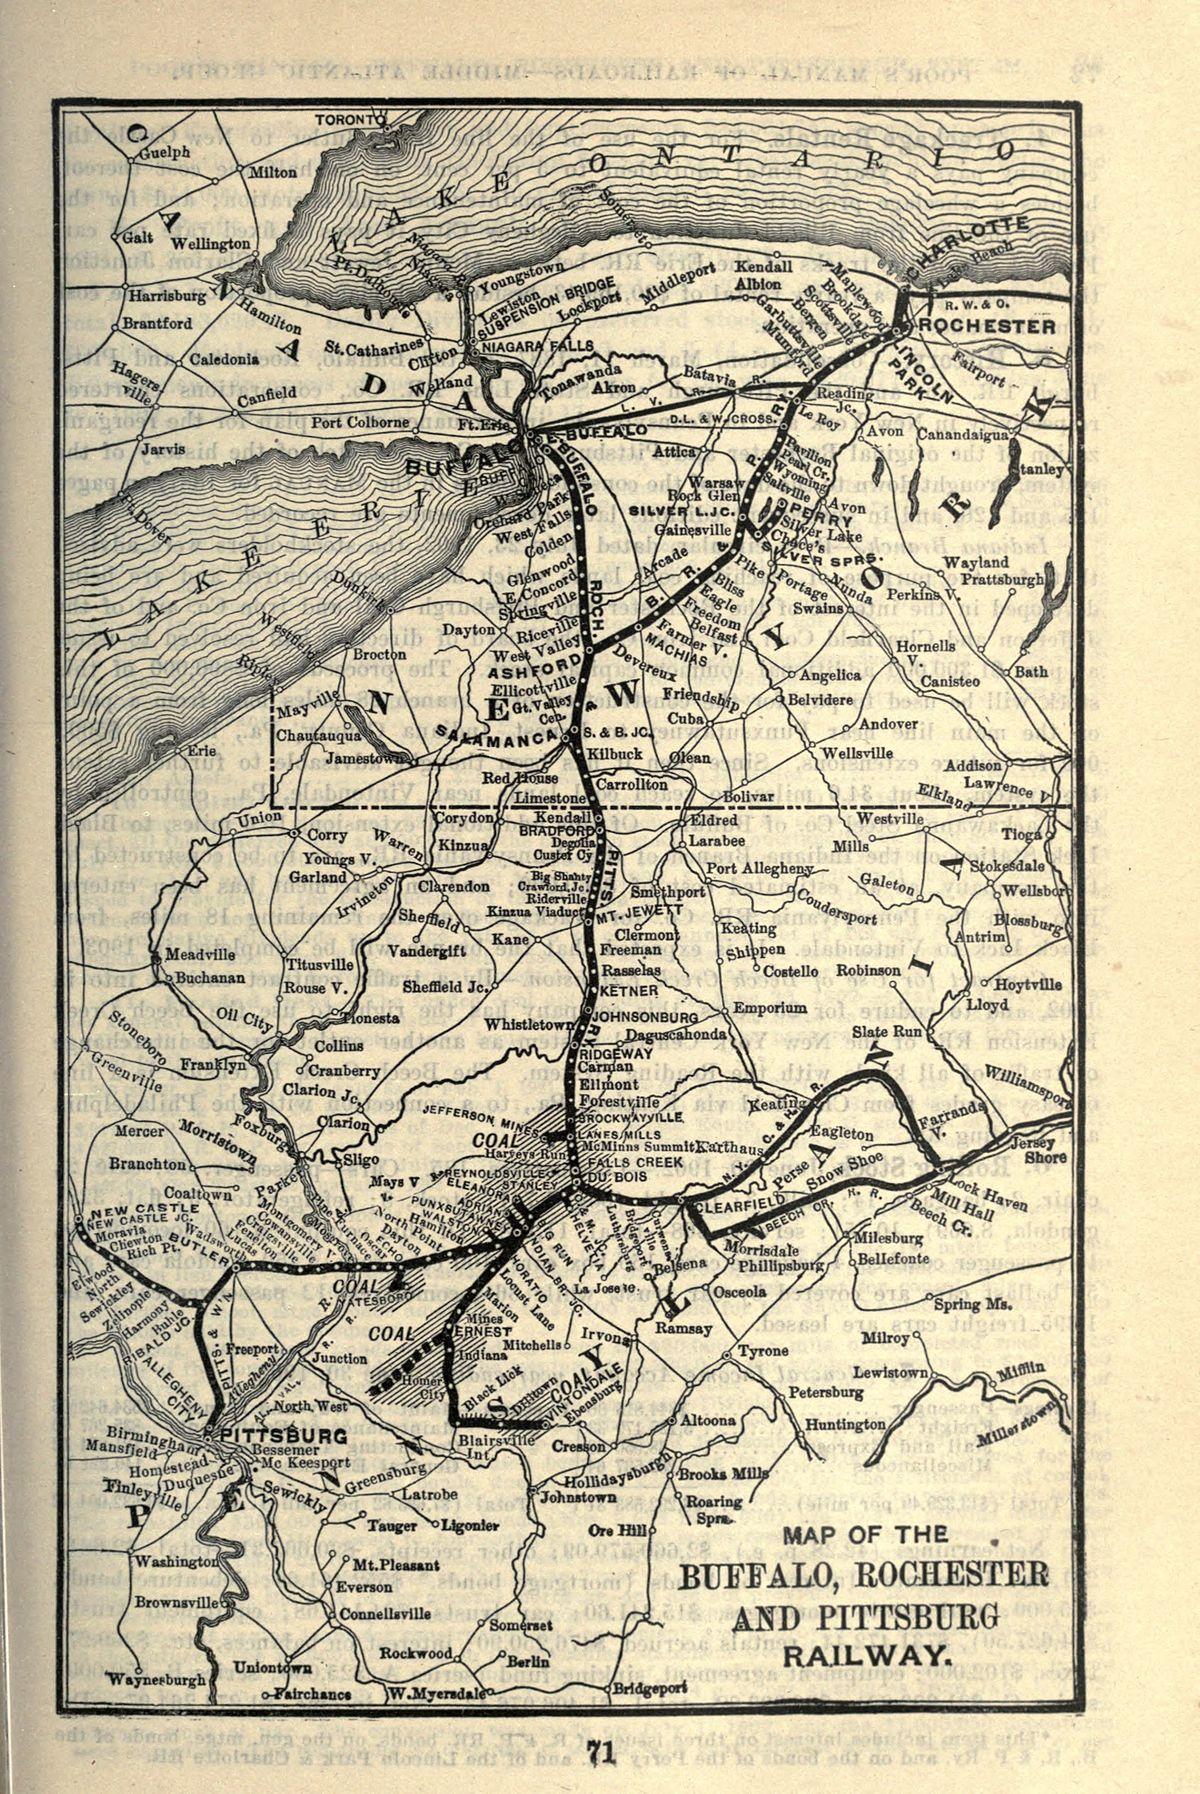 Buffalo, Rochester and Pittsburgh Railway - Wikipedia